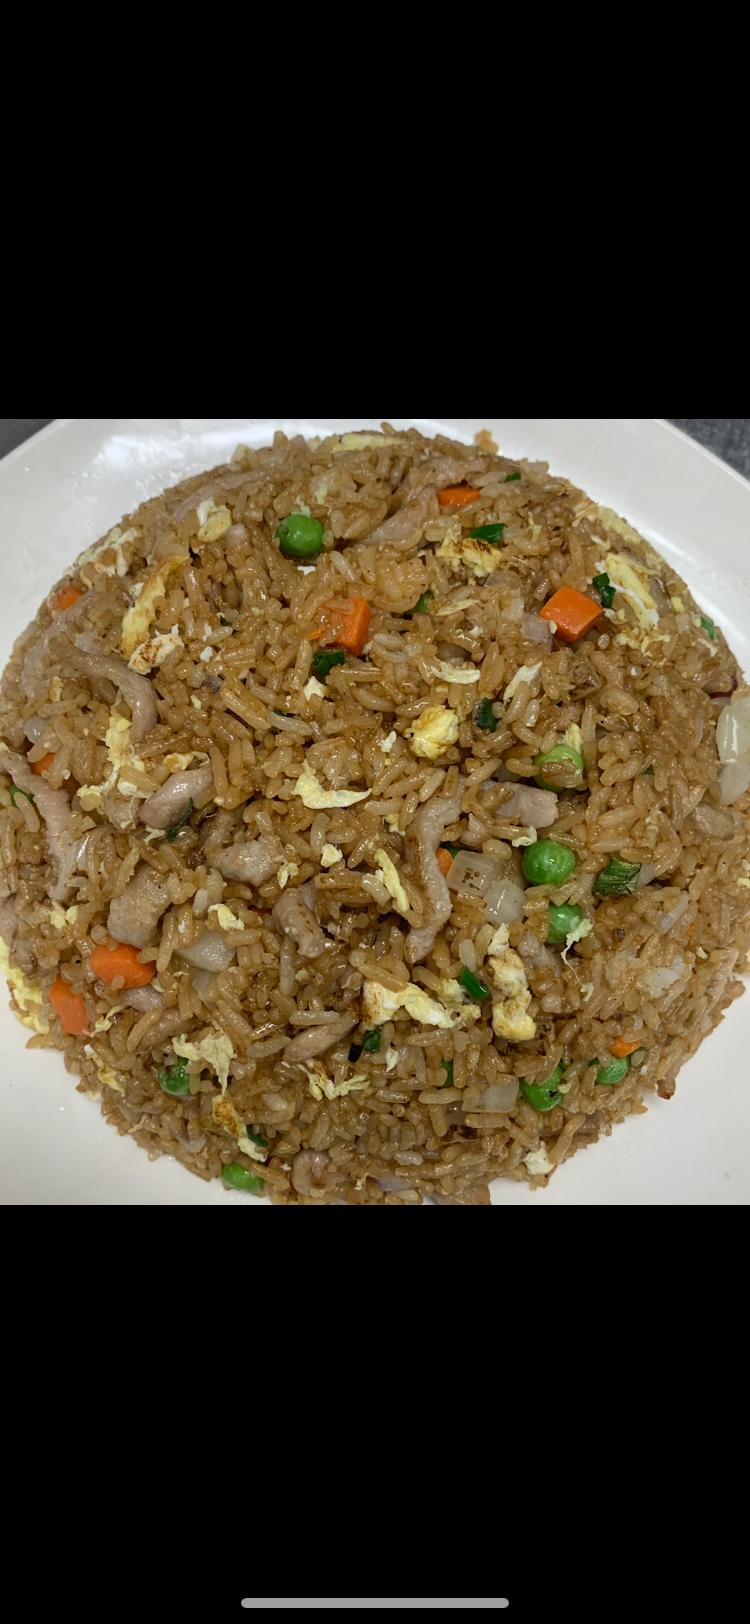 Shredded Pork Fried Rice 猪肉丝炒饭 Image